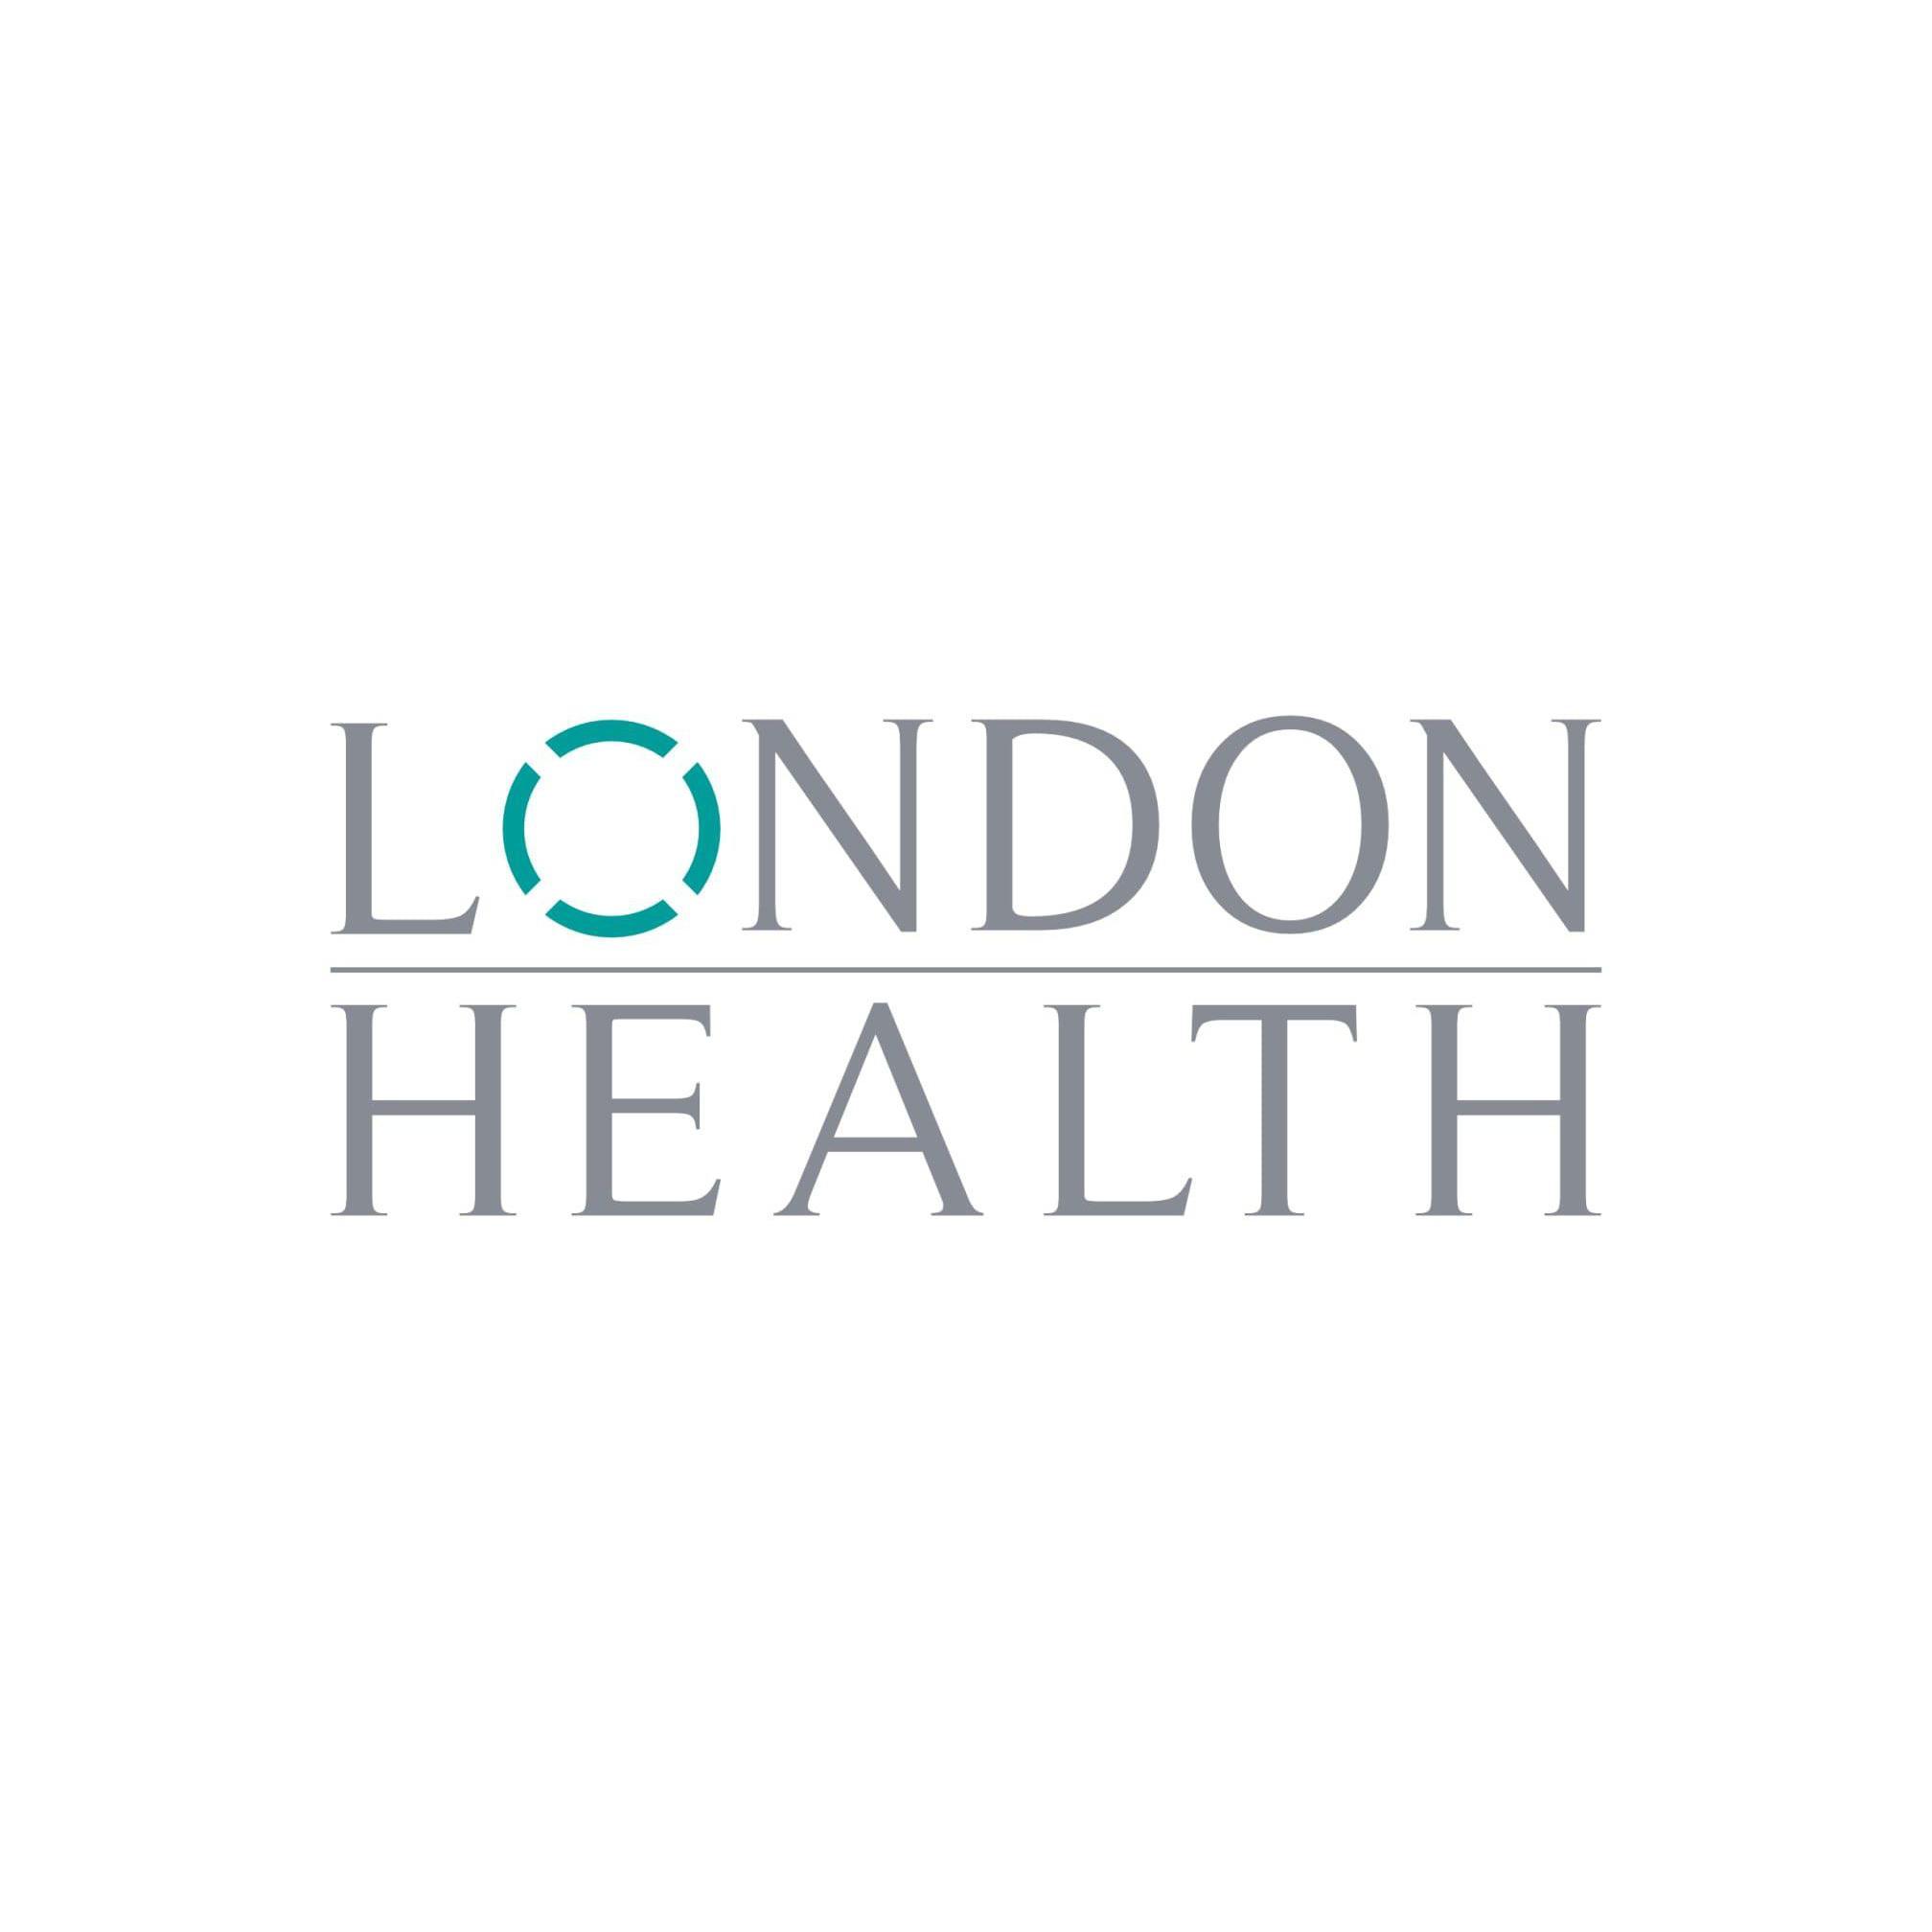 London Health - London, London SE1 7RG - 020 8123 7401 | ShowMeLocal.com